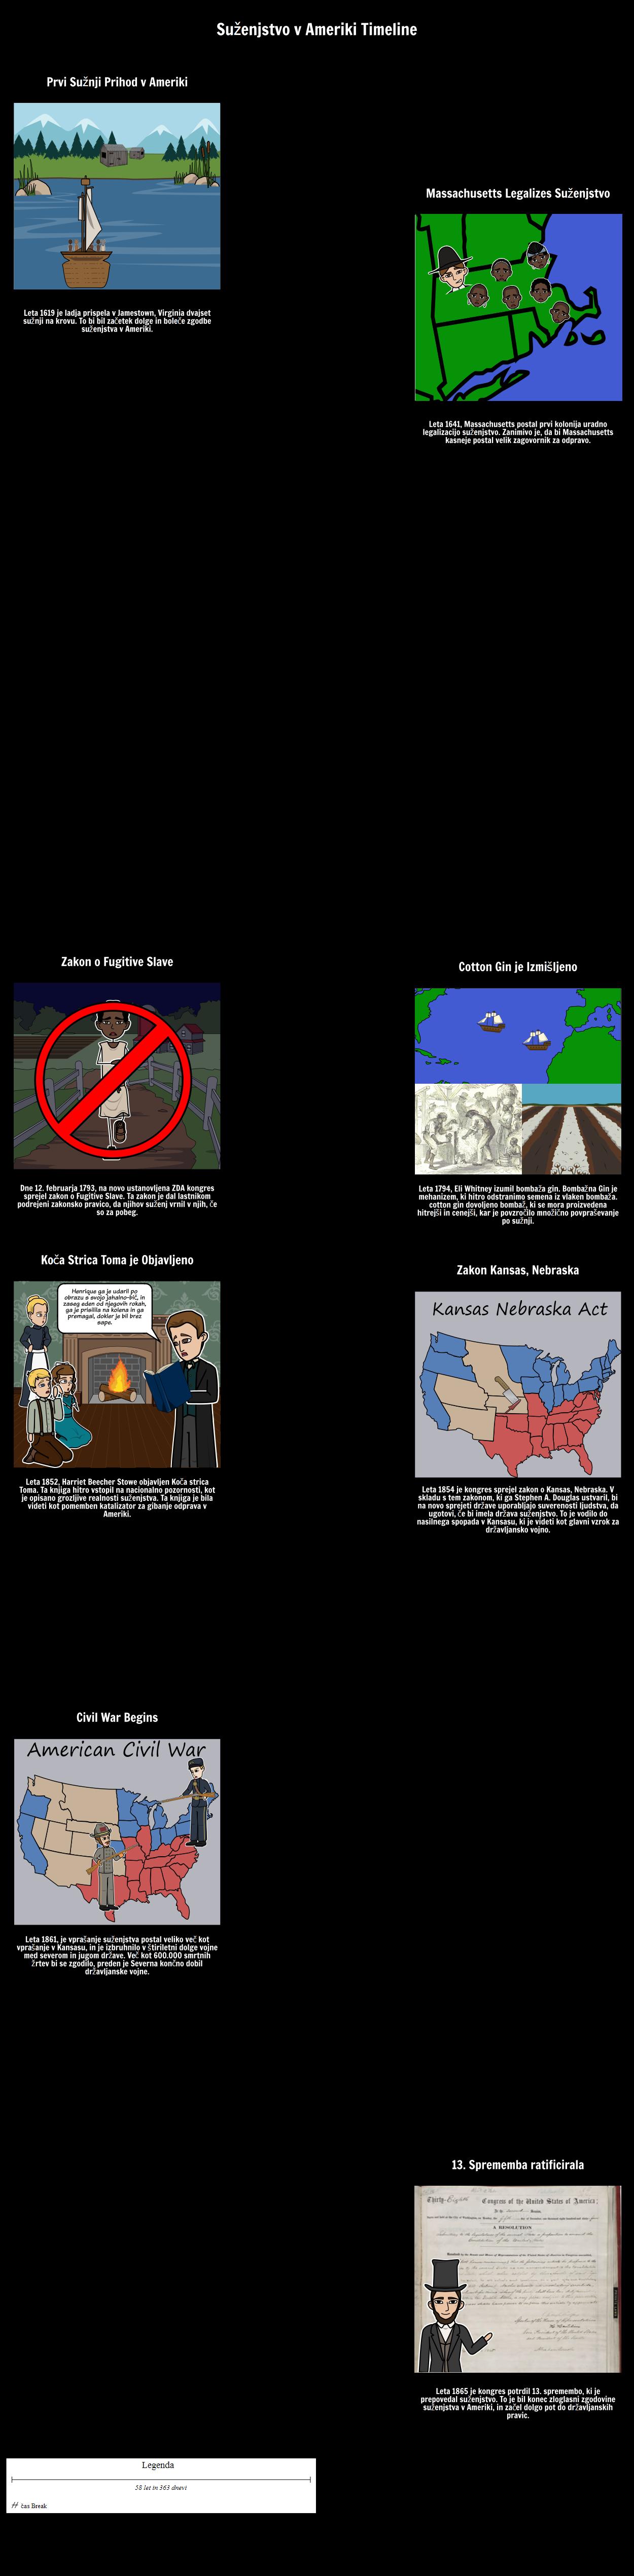 Suženjstvo v Ameriki Timeline